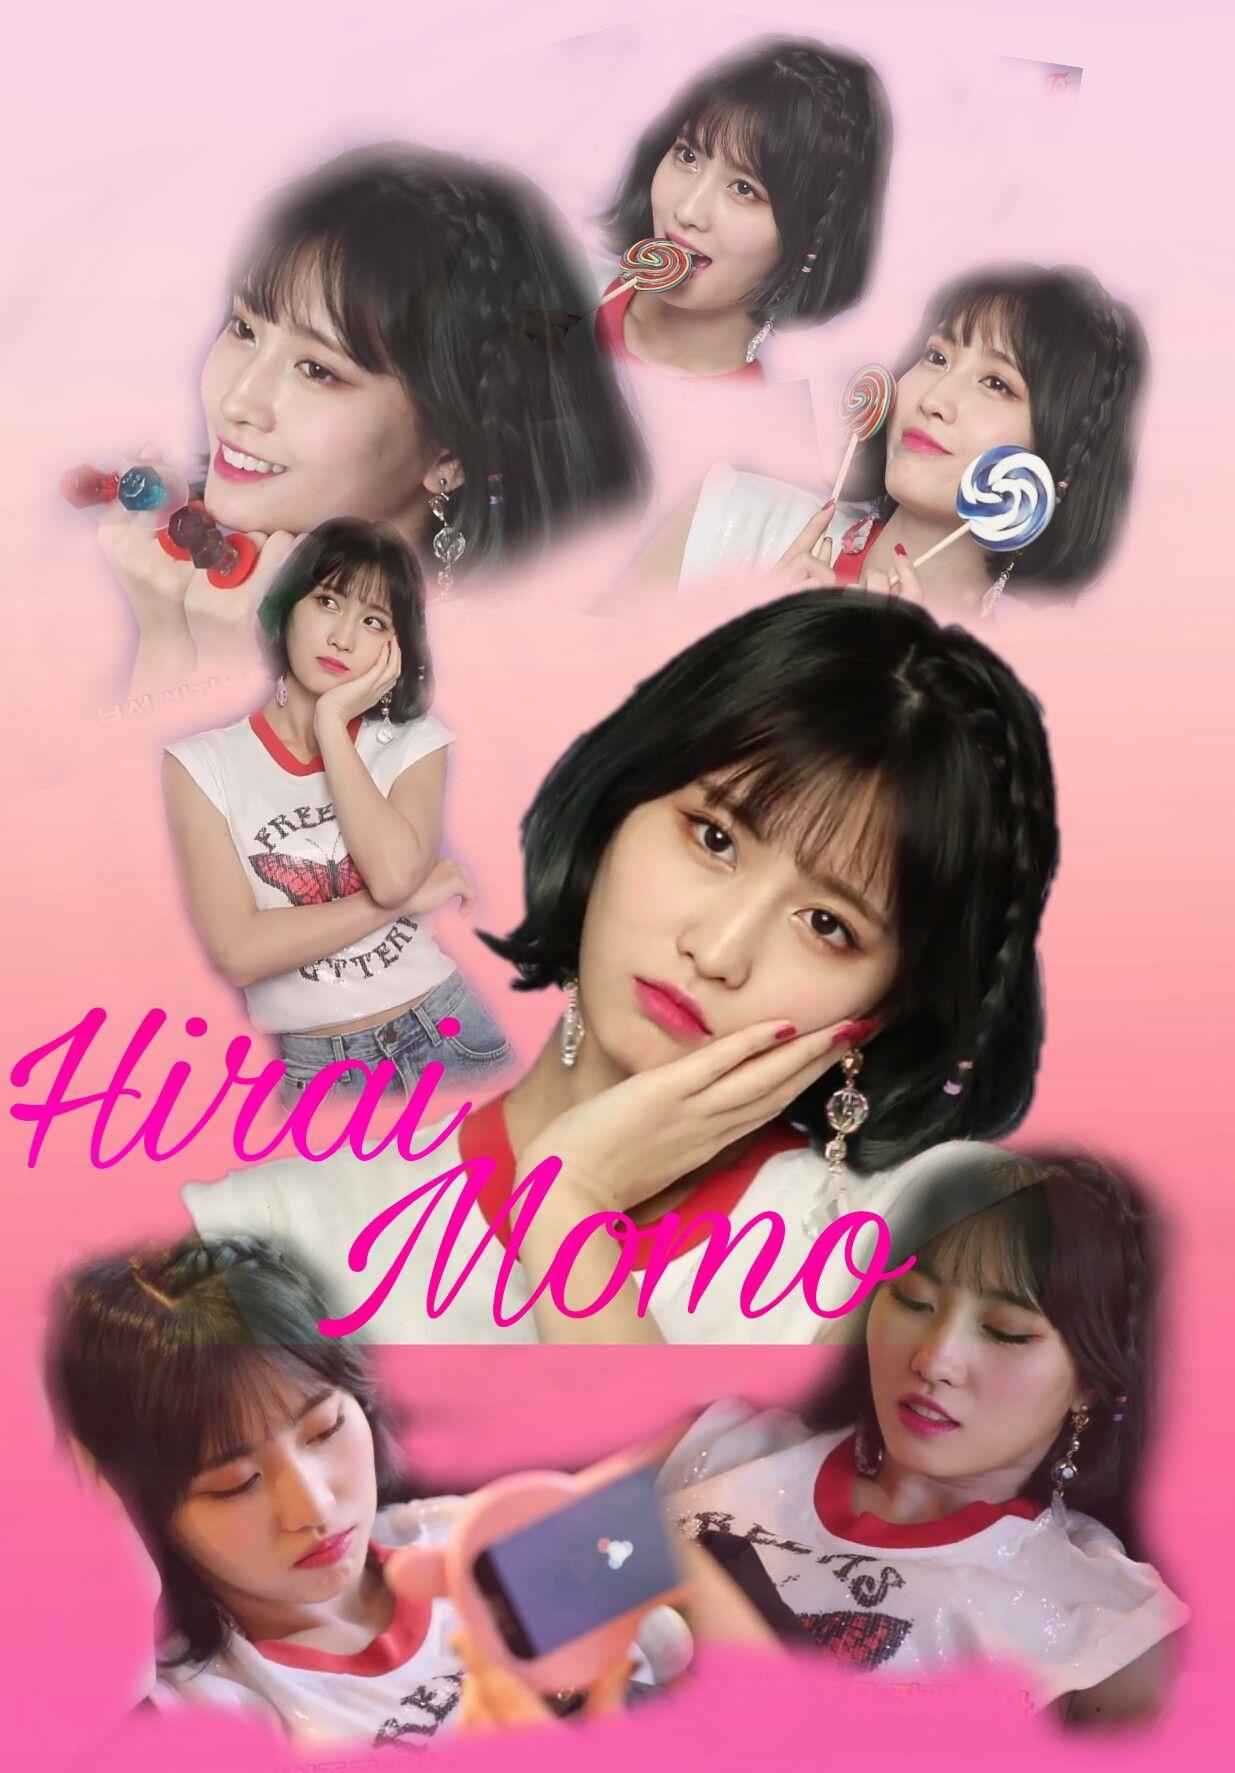 Free Download Twice Hirai Momo Wallpaper Twice Wallpaper